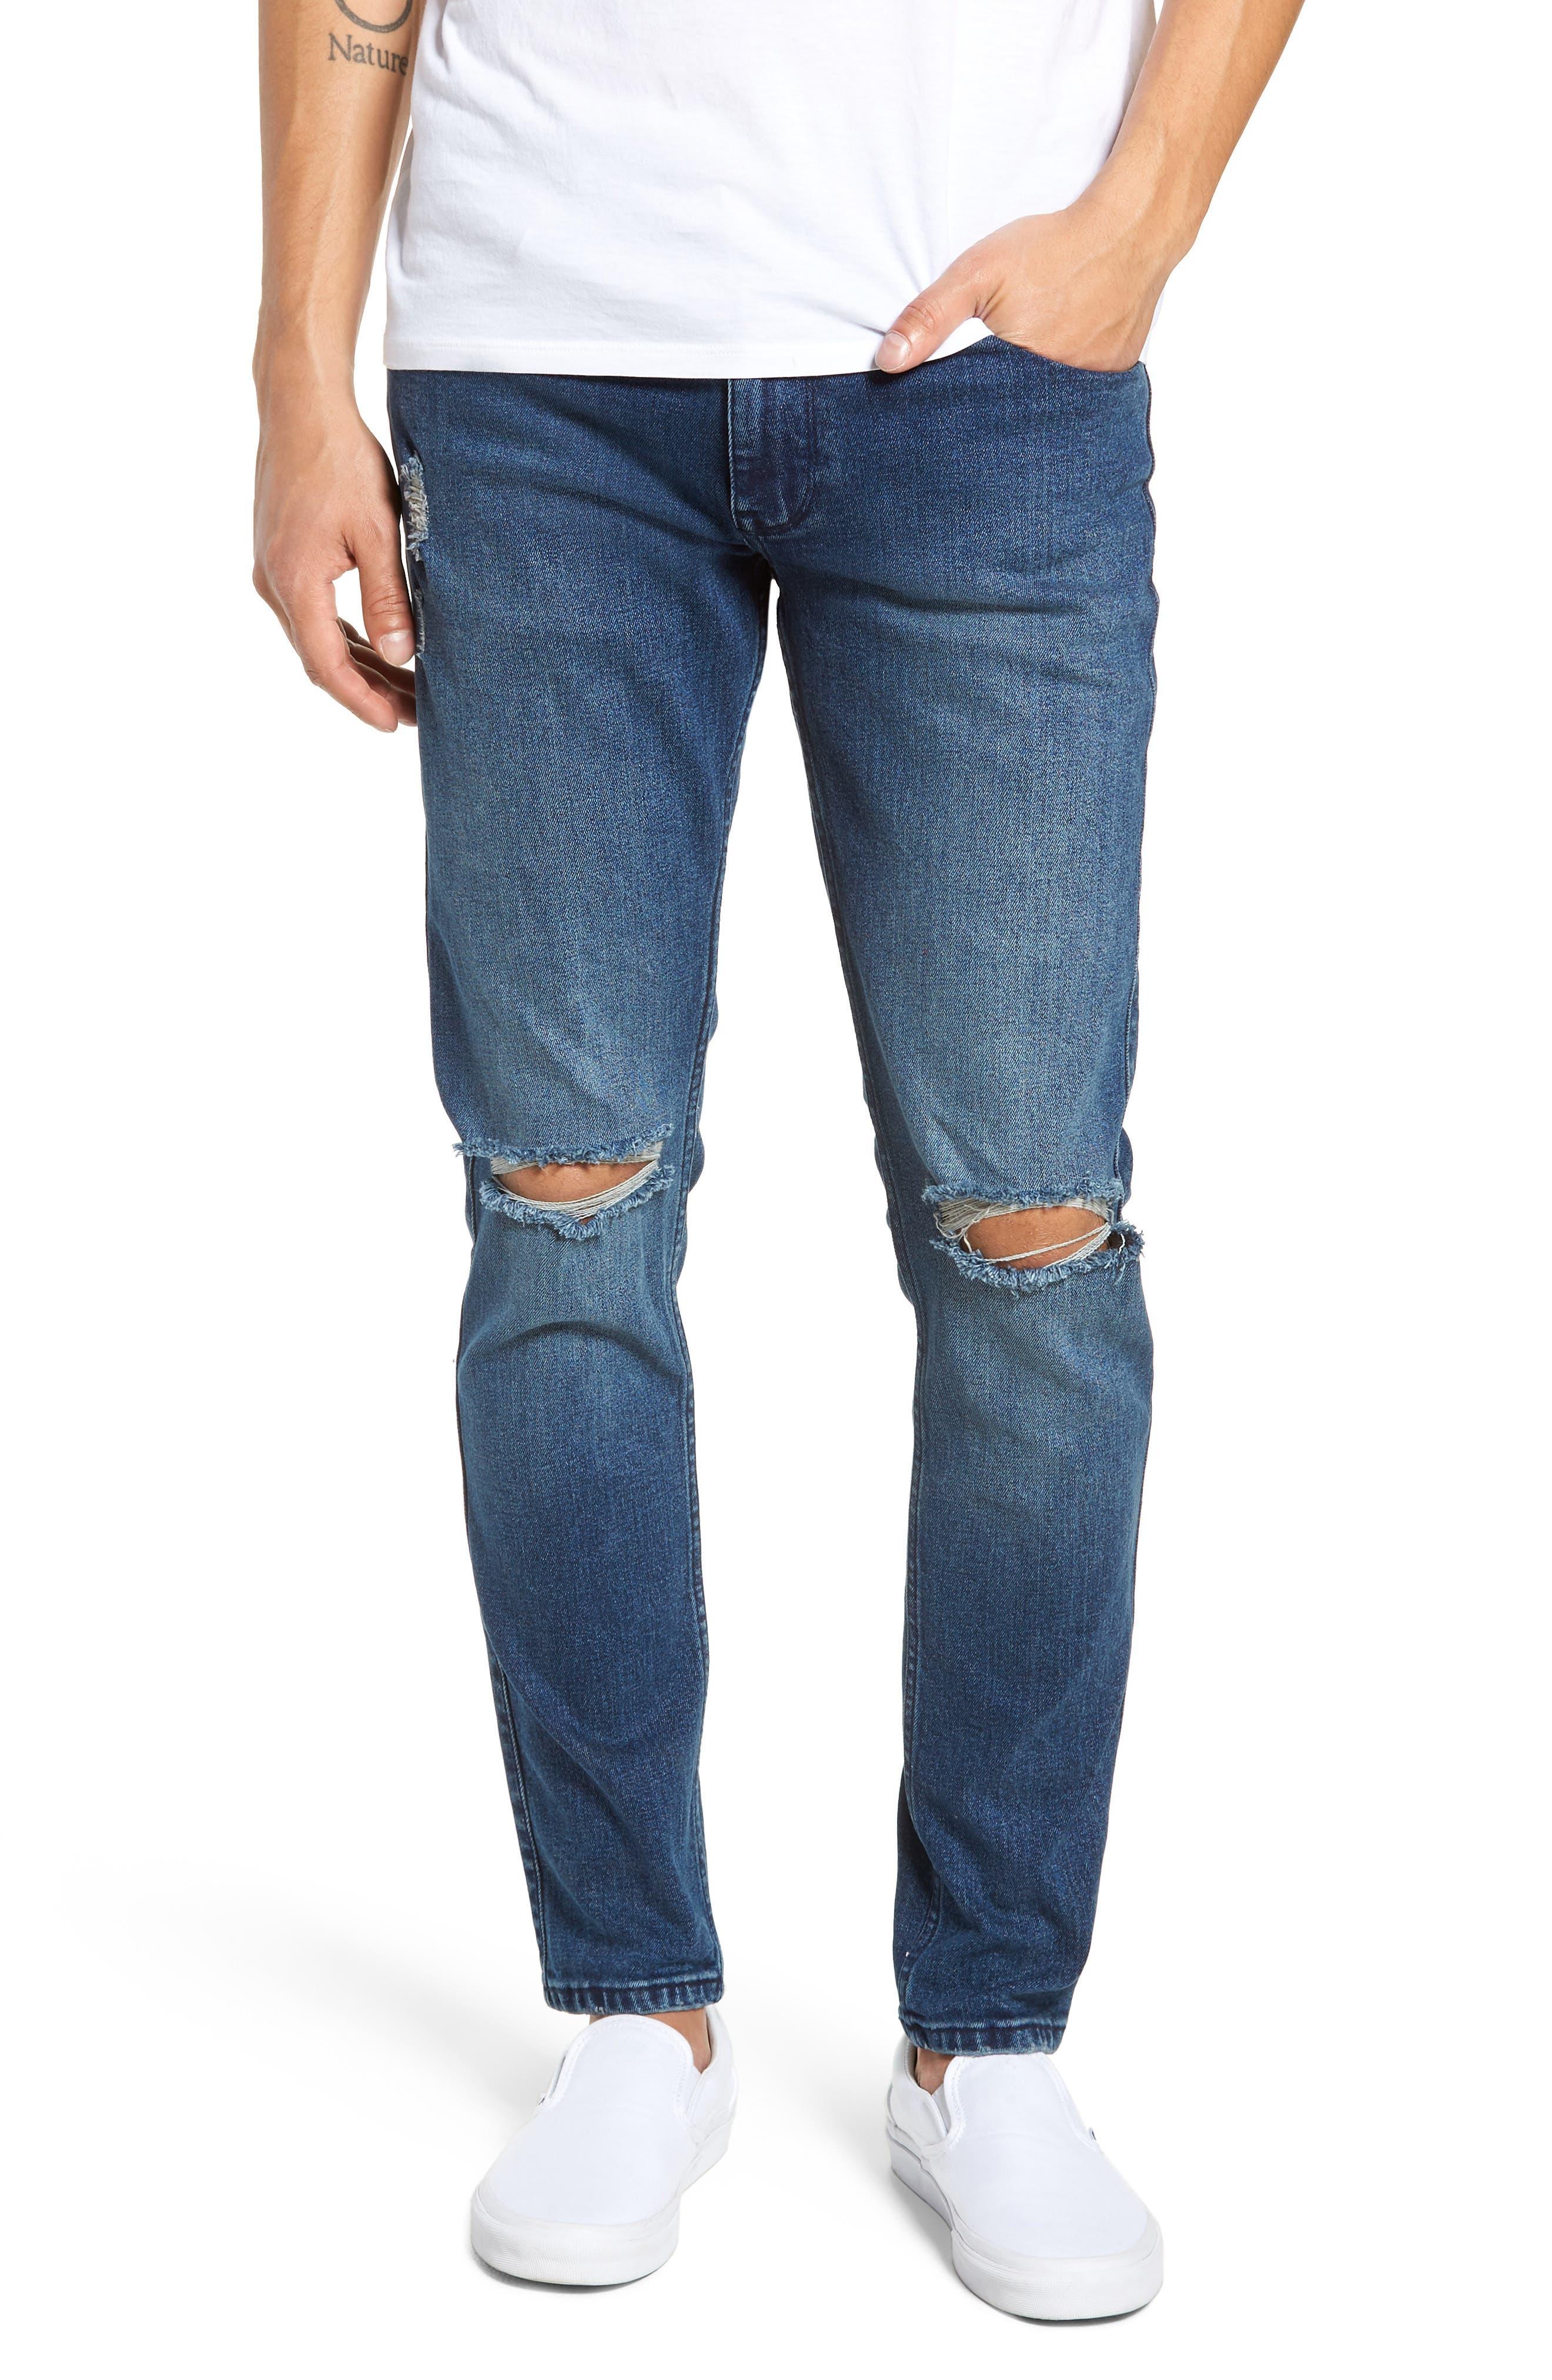 Clark Slim Straight Leg Jeans,                         Main,                         color, WORN ASH BLUE DAMAGED